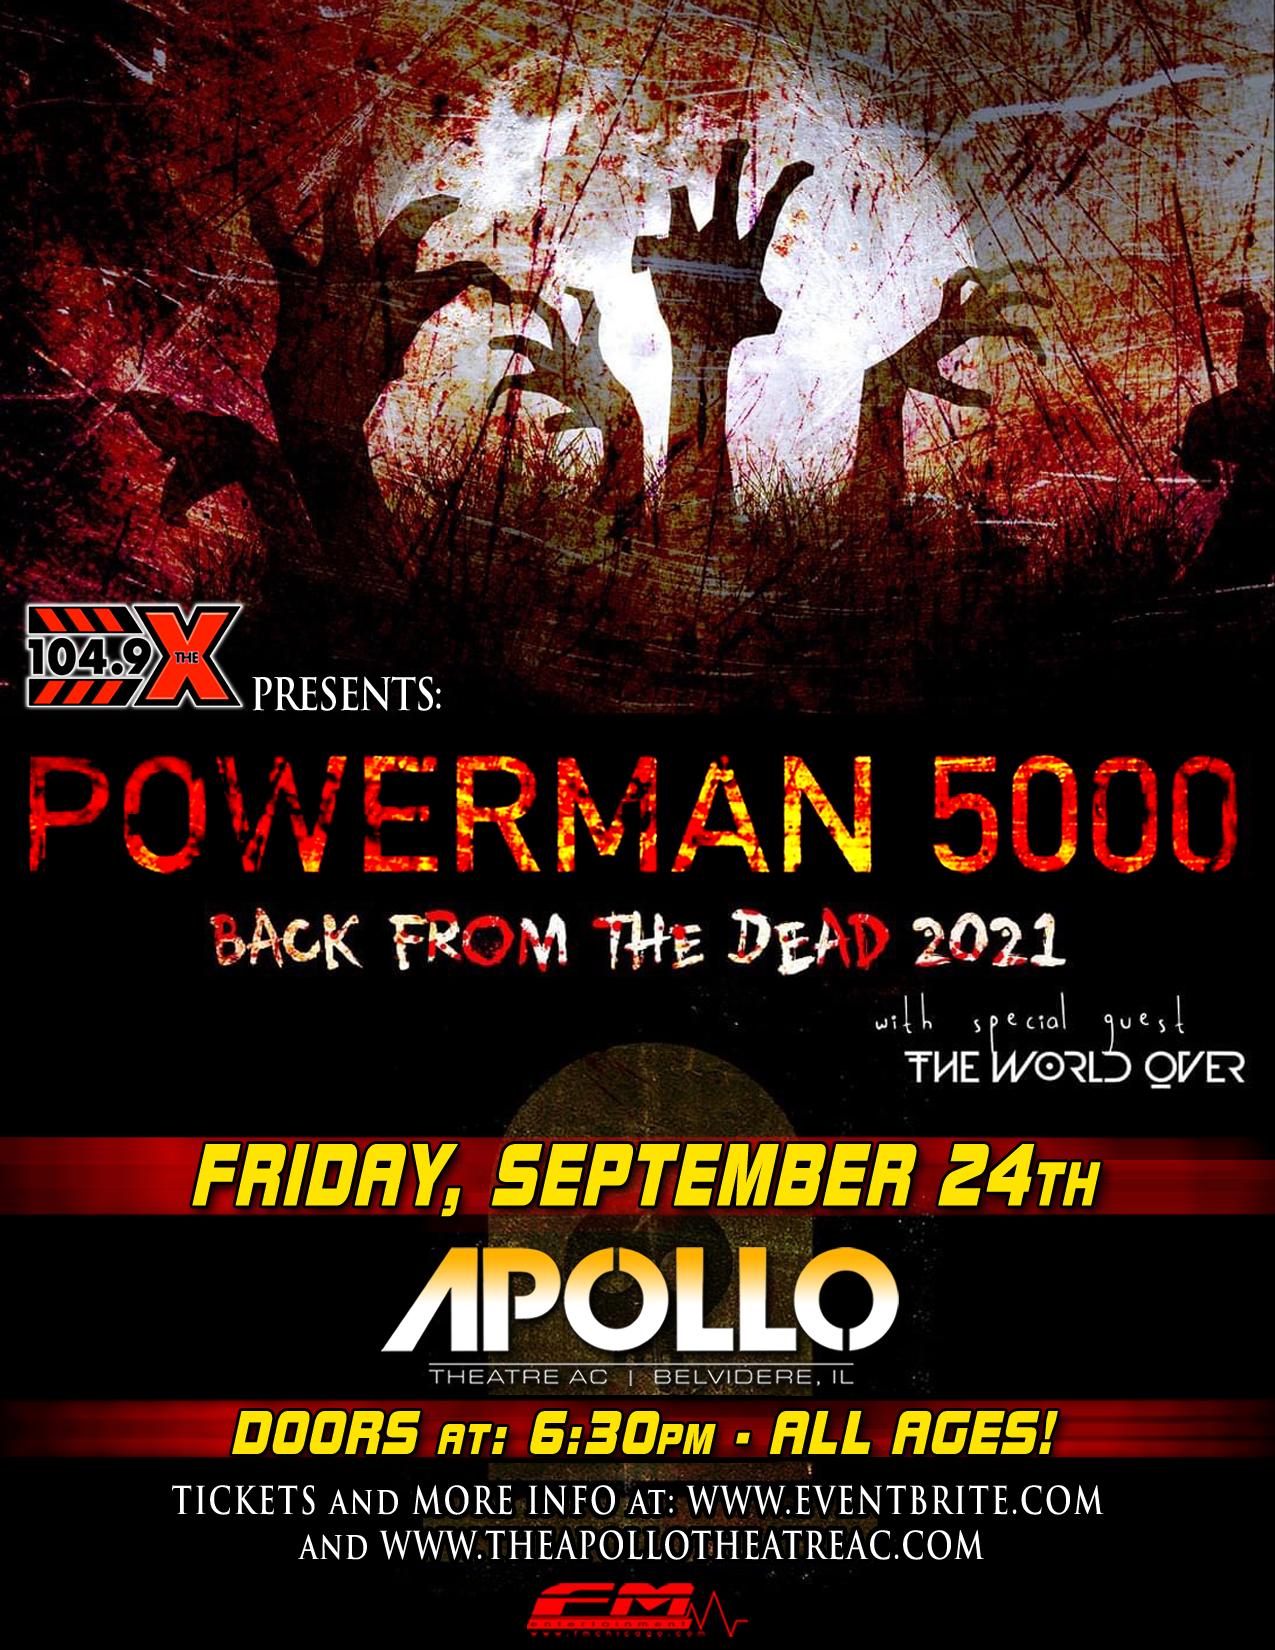 powerman_5000-8x11